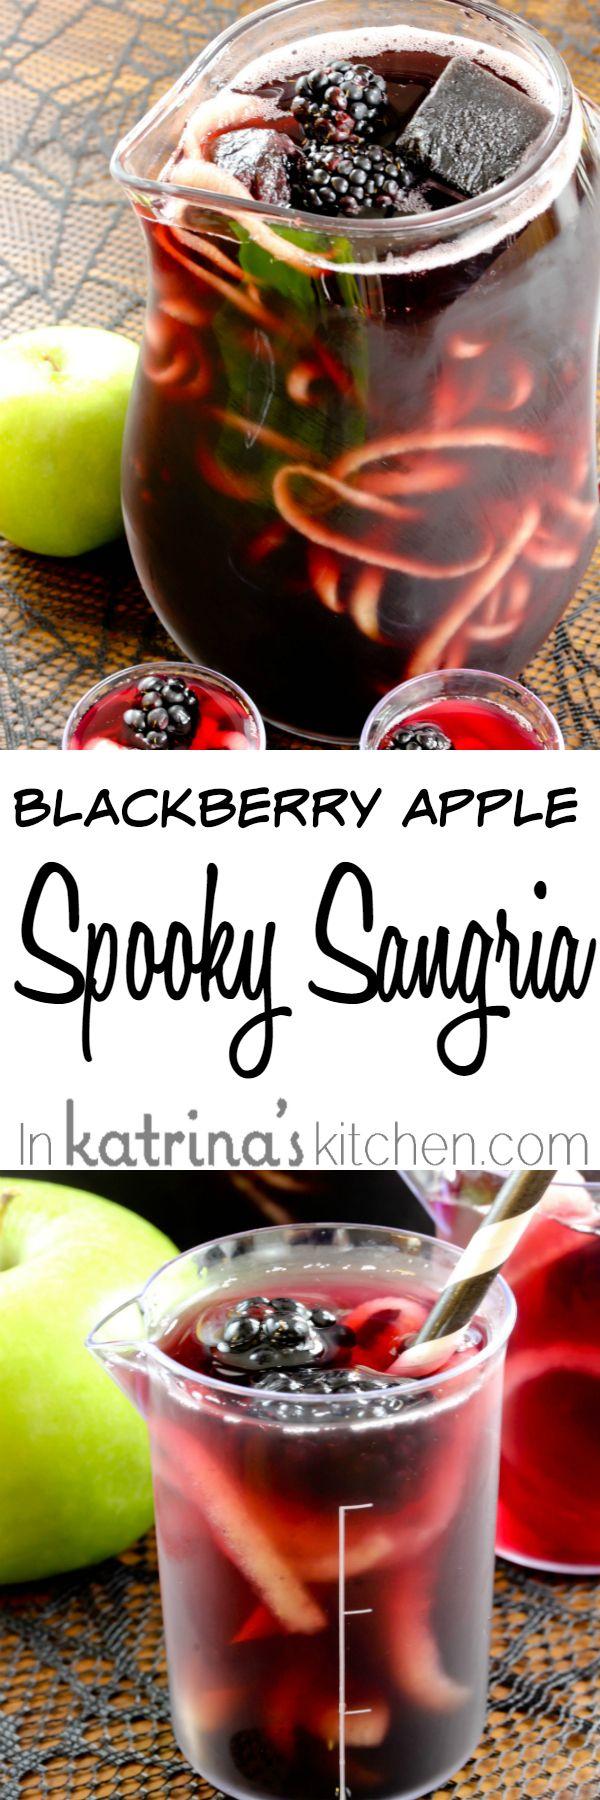 Blackberry Apple Spooky Sangria Recipe